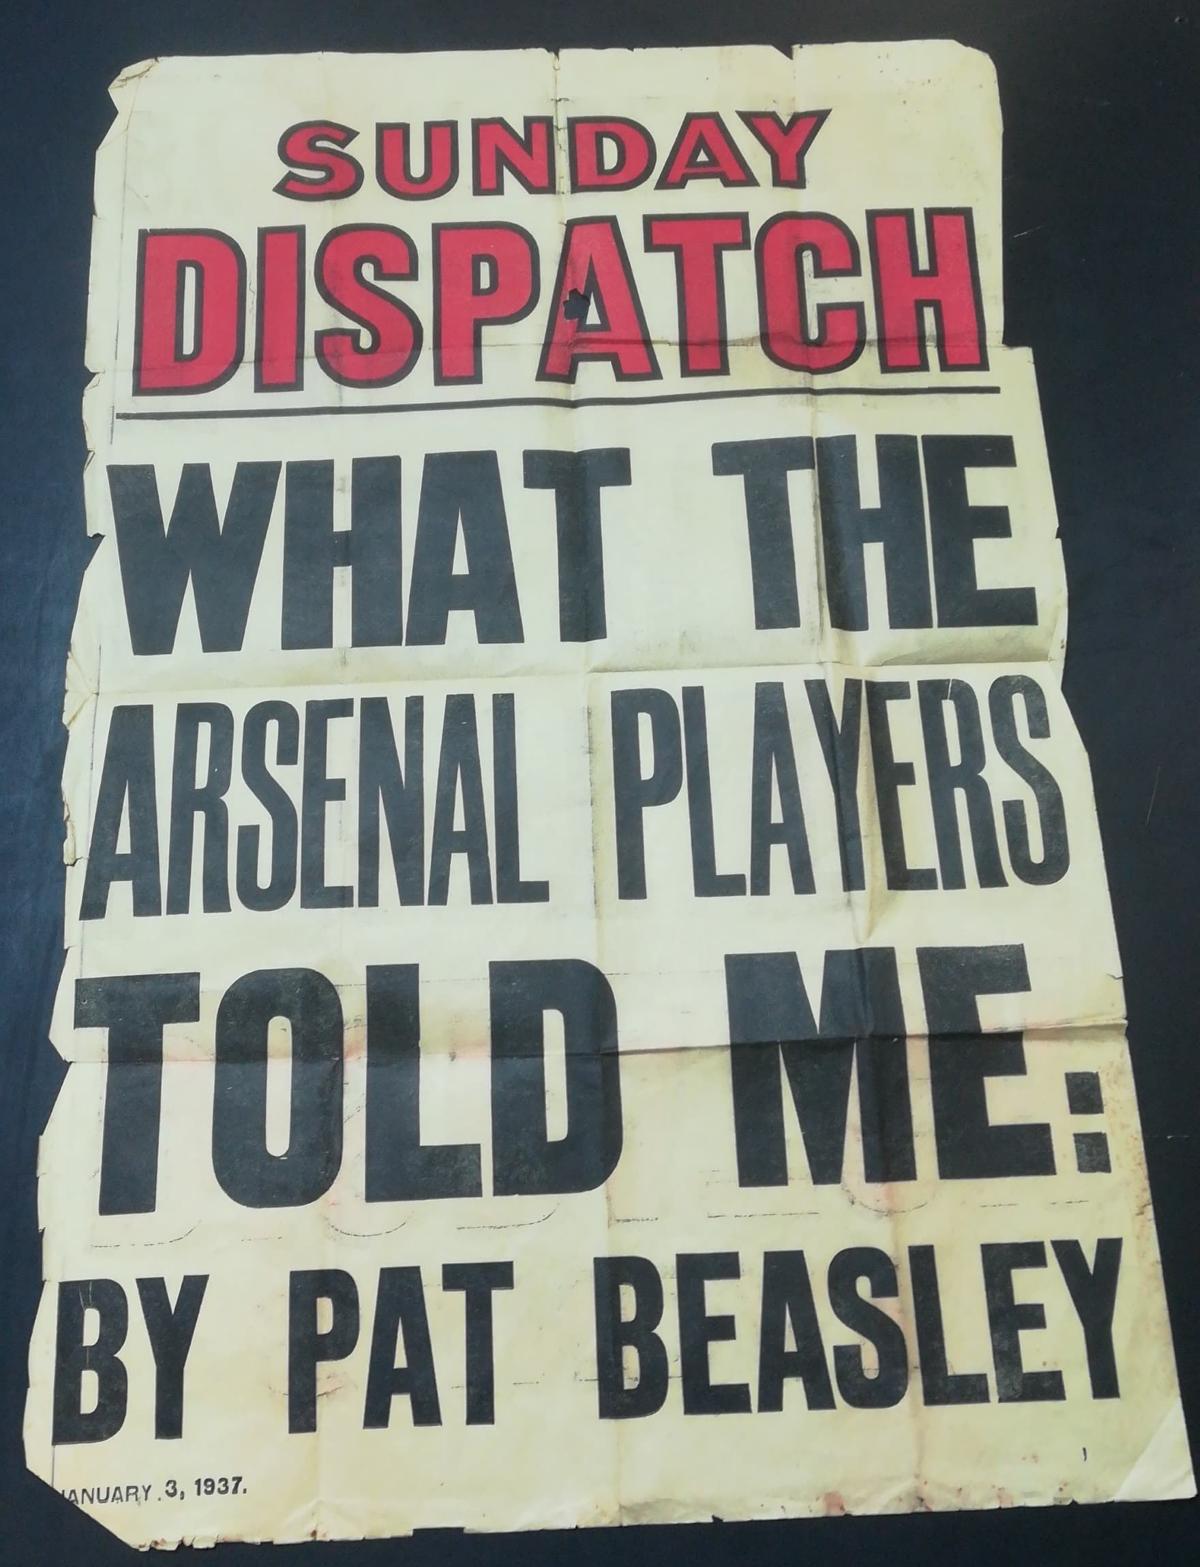 Pat Beasley - Newspaper Billboard Poster